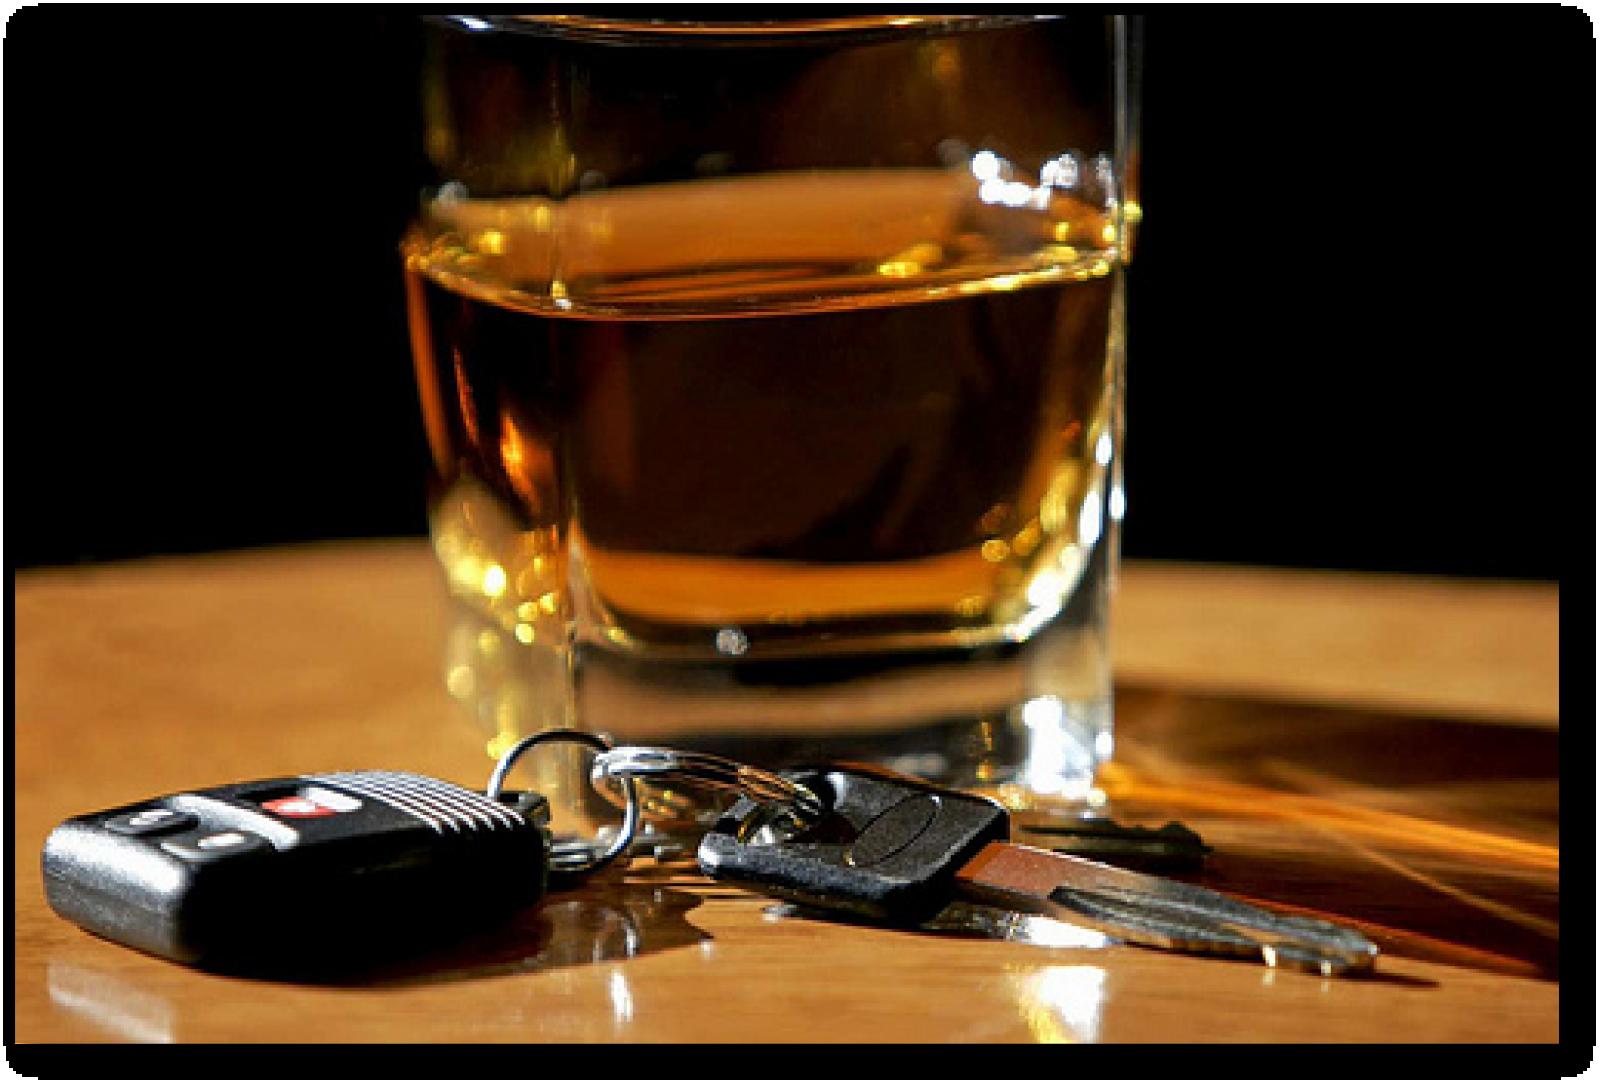 Гаишники поймали пьяного депутата за рулем без водительских прав